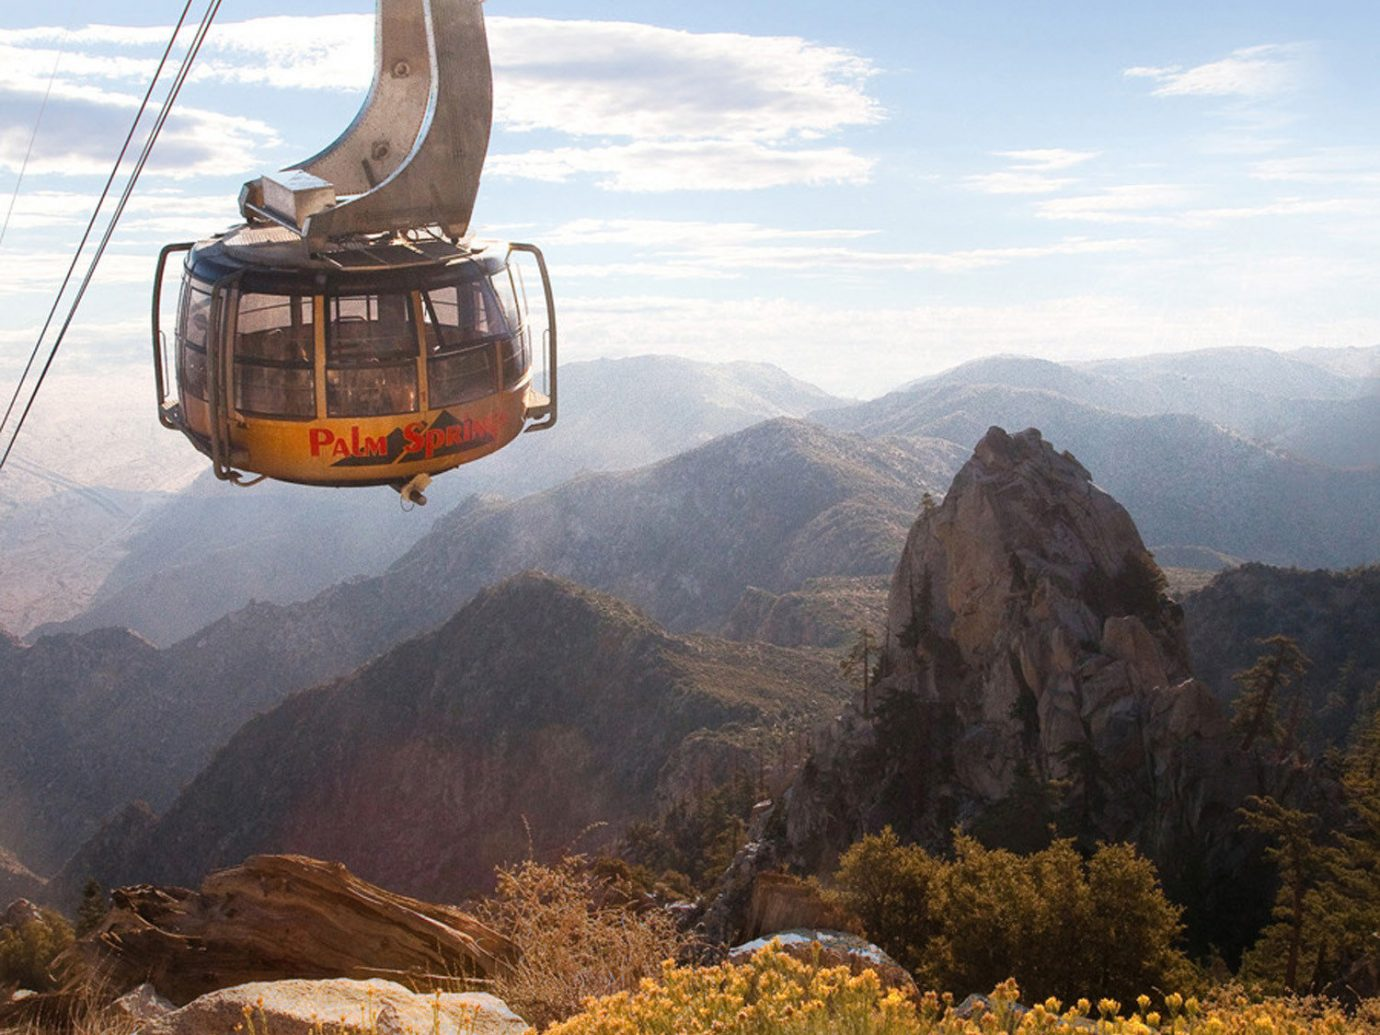 Jetsetter Guides sky mountain outdoor mountainous landforms landform wilderness transport hill landscape mountain range cable car Adventure Sea vehicle